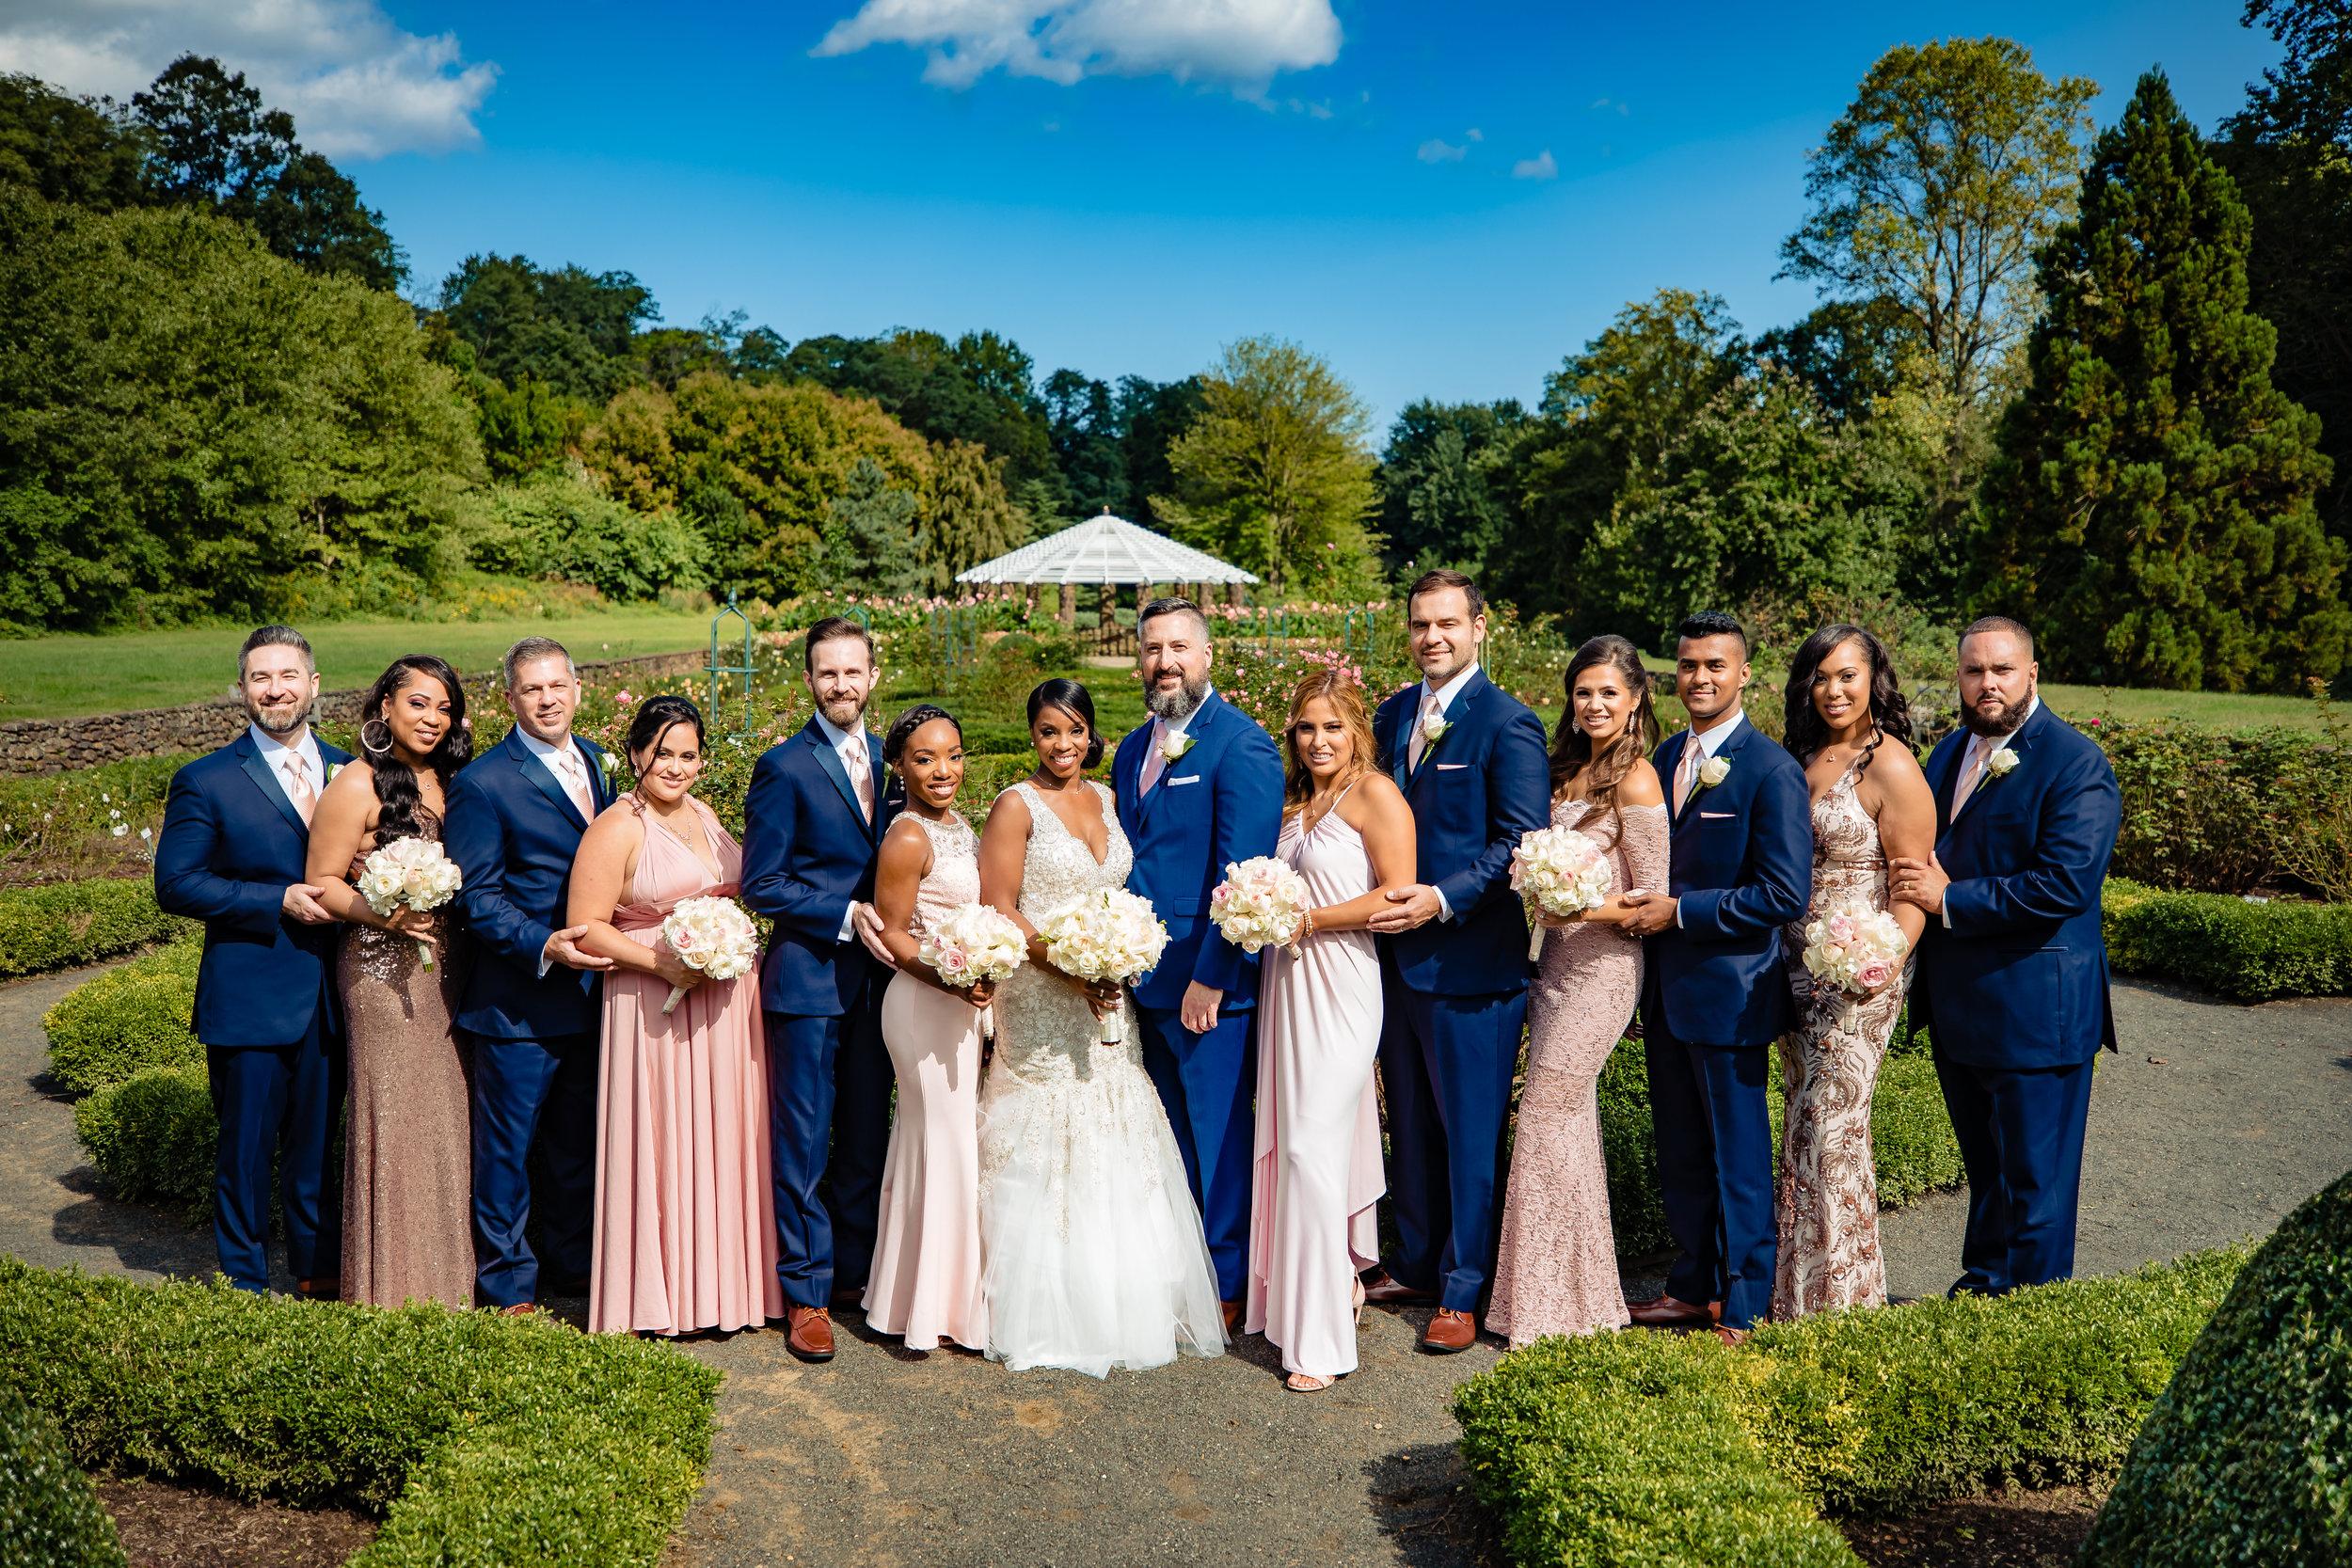 bridesmaids, groomsmen, bridal party, bride and groom at deep cu